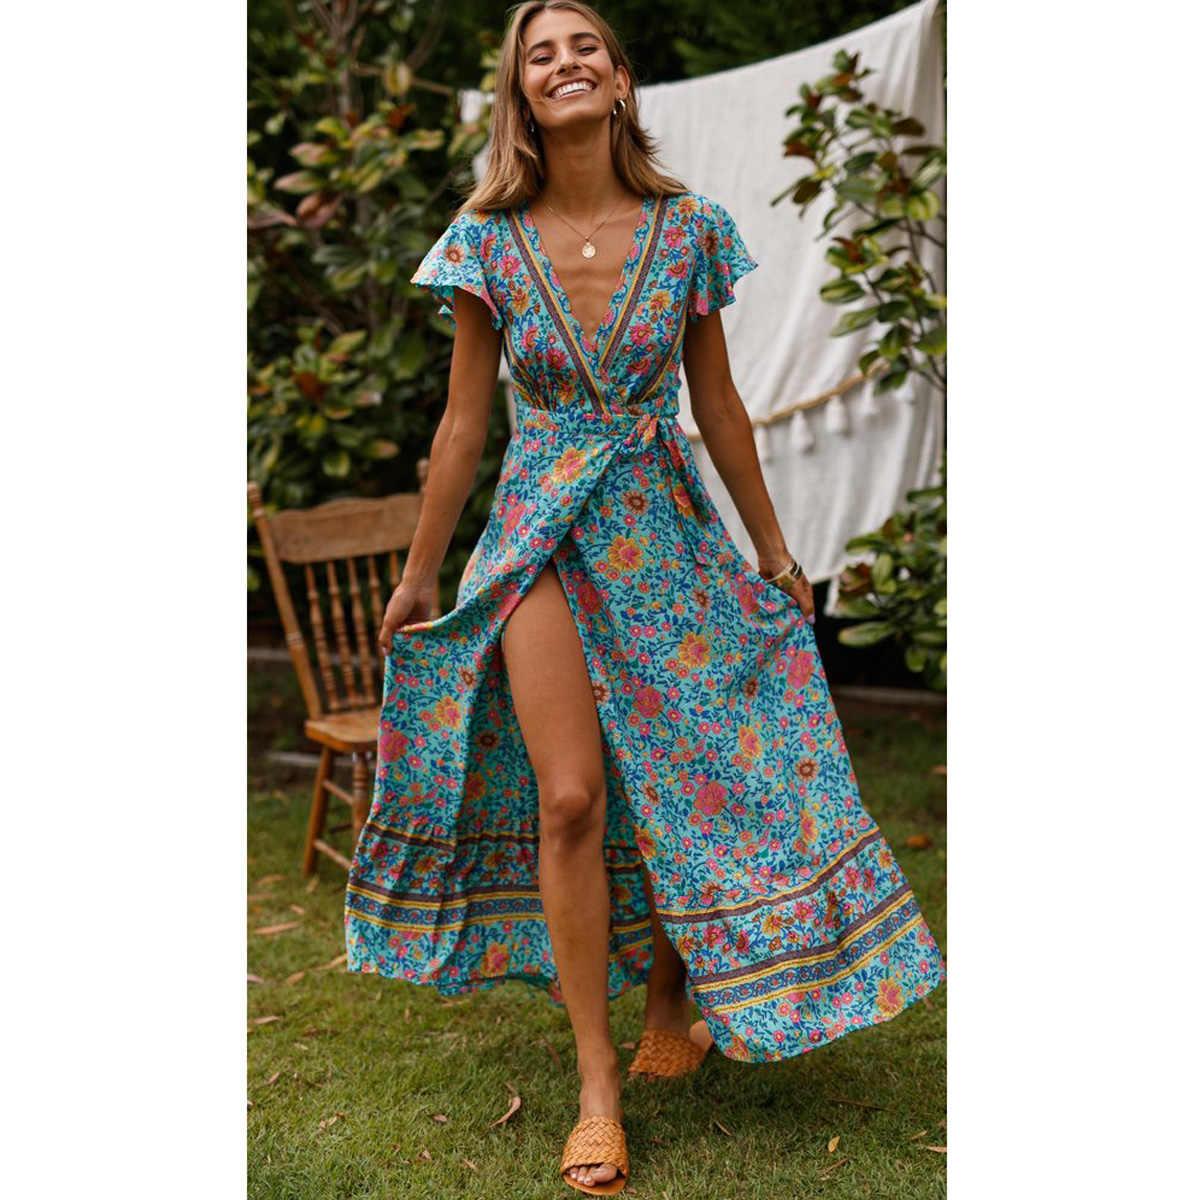 Michael Kors Wrap Dress ... Jastie Green Floral Print Wrap Dress Short Butterfly Sleeves Boho  Summer Dresses V-Neck Women ...